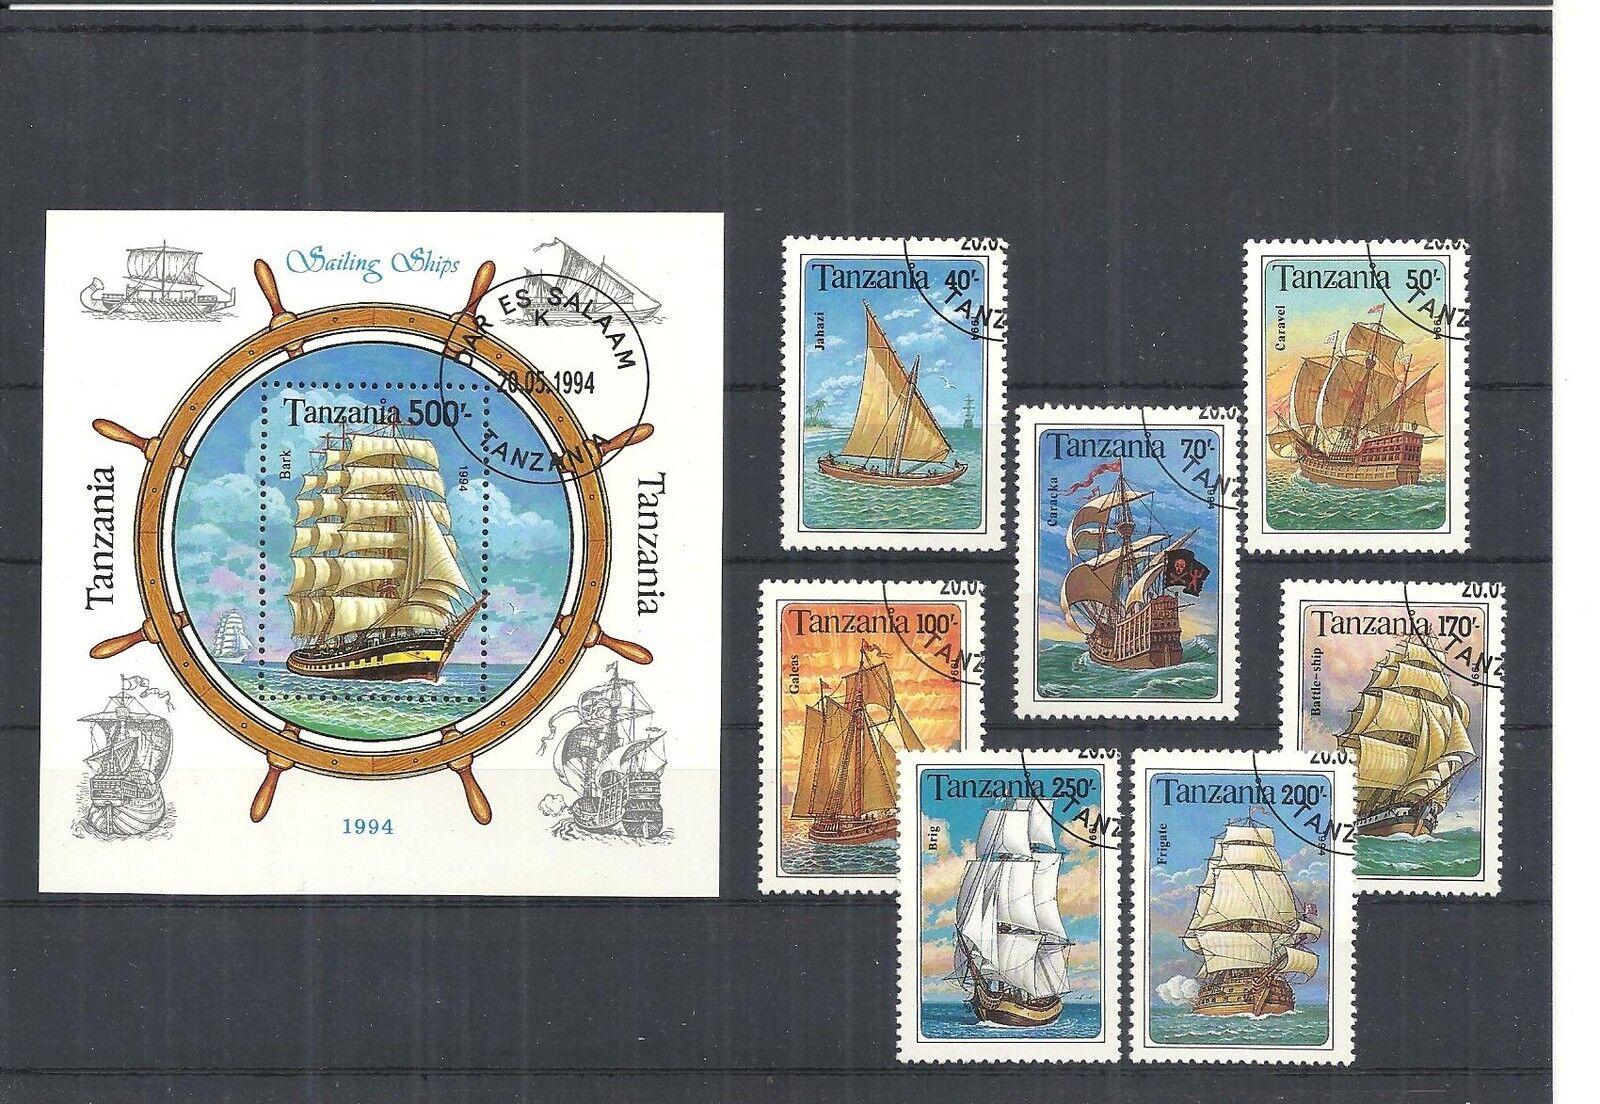 Afrika, Tansania/Tschad 1971 - 1994, Sammlungen mit Blöcken, sauber gestempelt o 1994 (1)